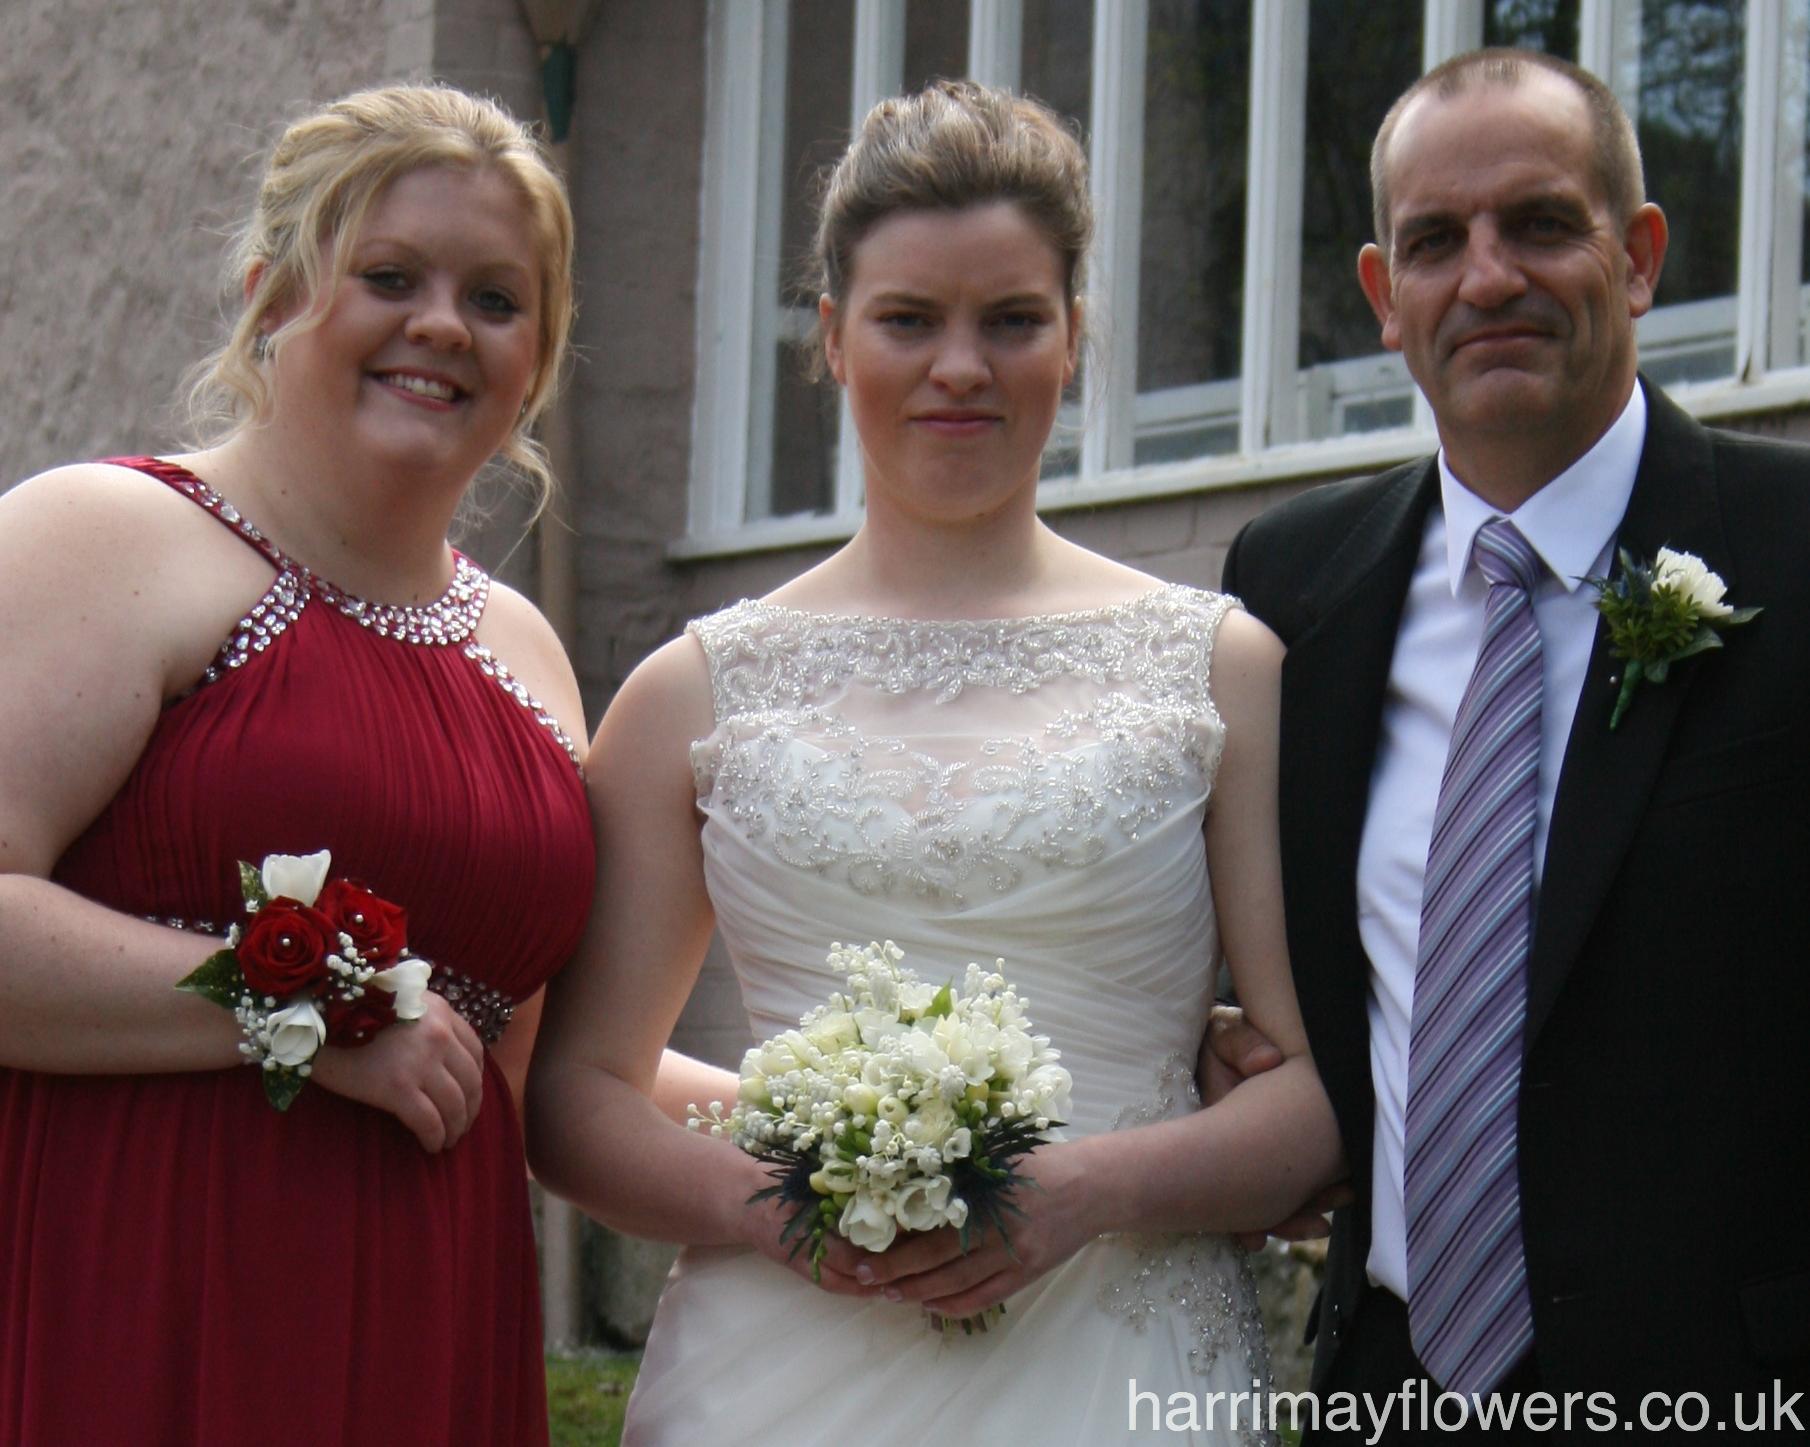 Izzi, Bridesmaid & Father